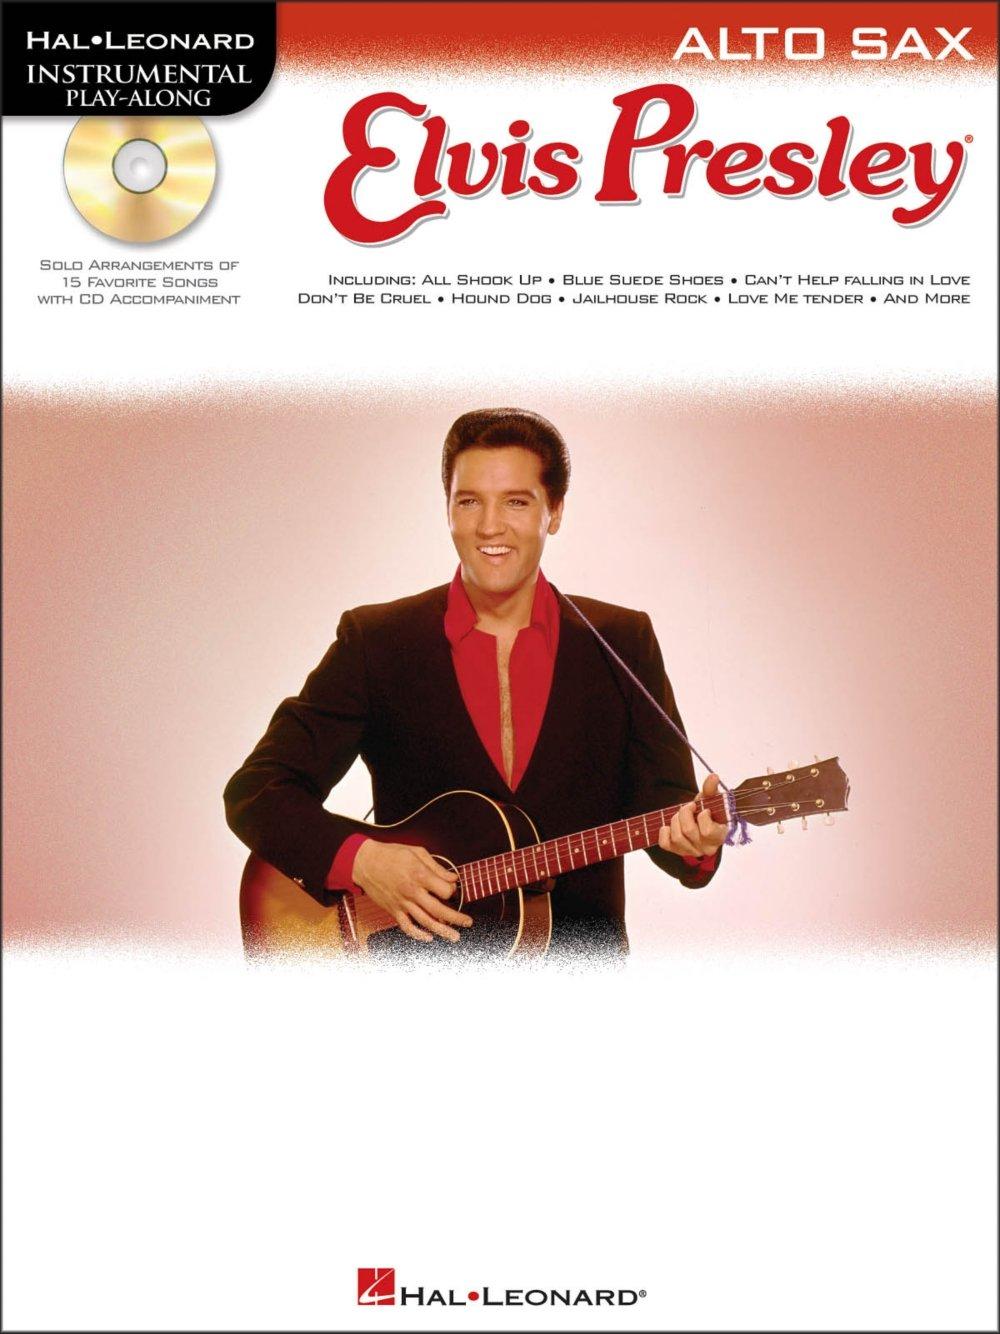 Elvis Presley for Alto Sax Musiknoten B003VF9ECG 842365